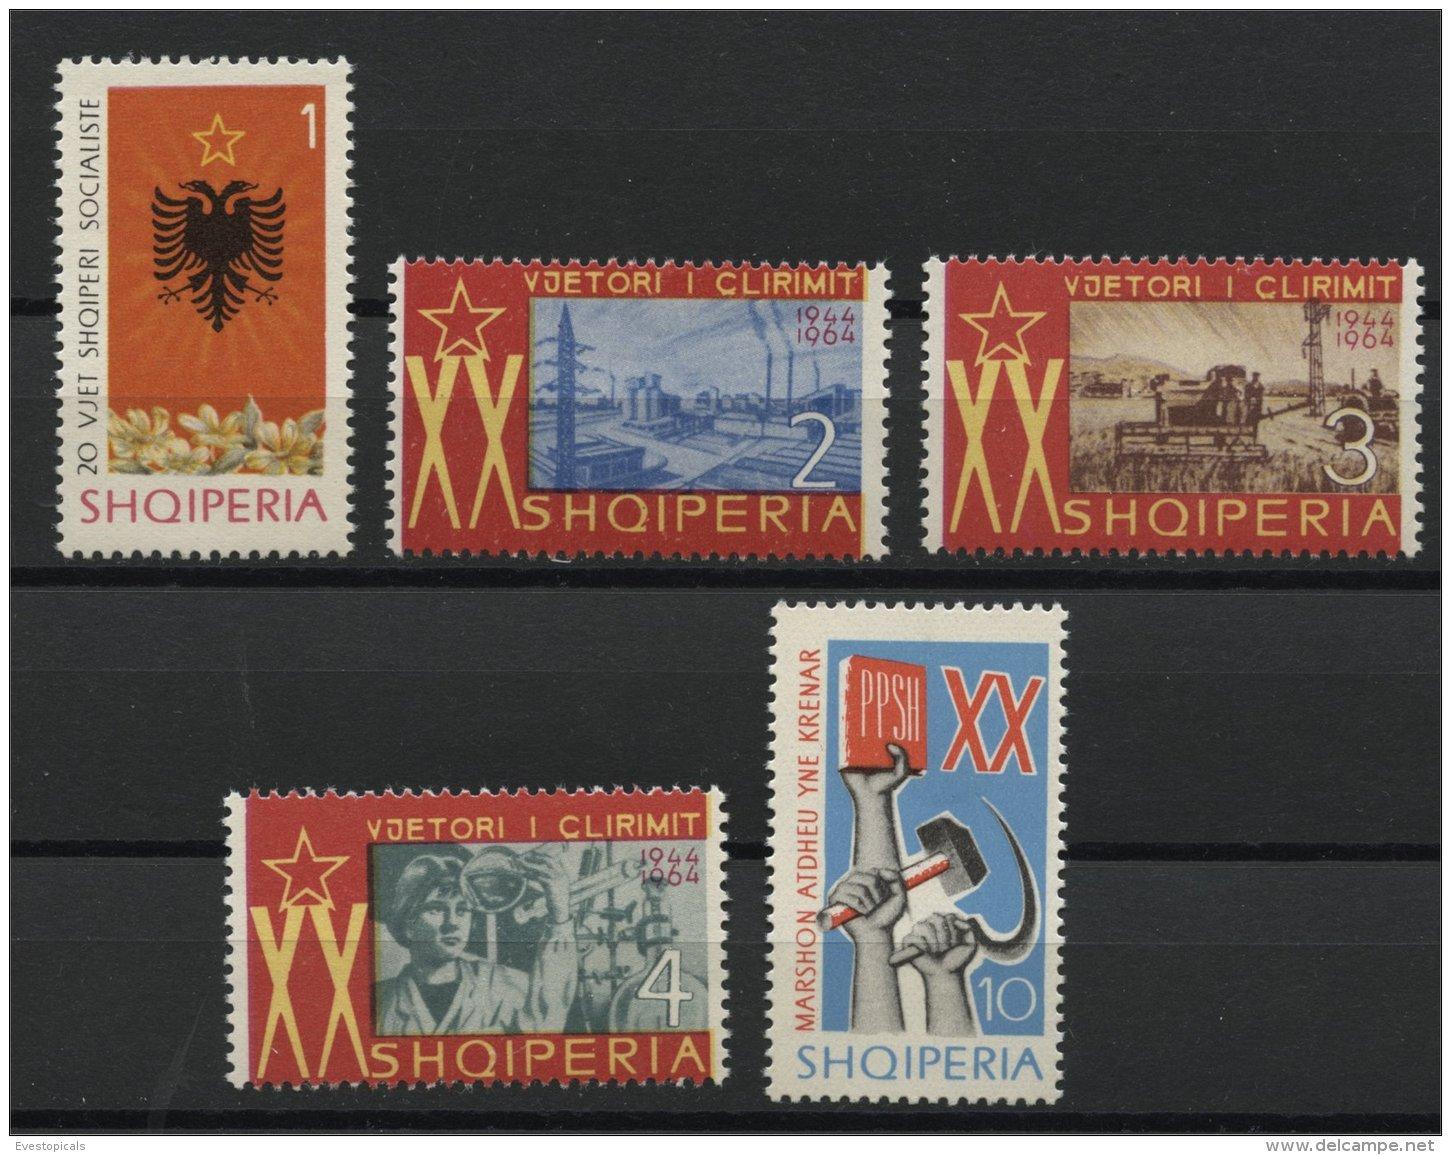 ALBANIA, 20TH YEARS ANNIVERSARY OF THE SOCIALIST SEIZURE OF POWER 1964, NH SET - Albania